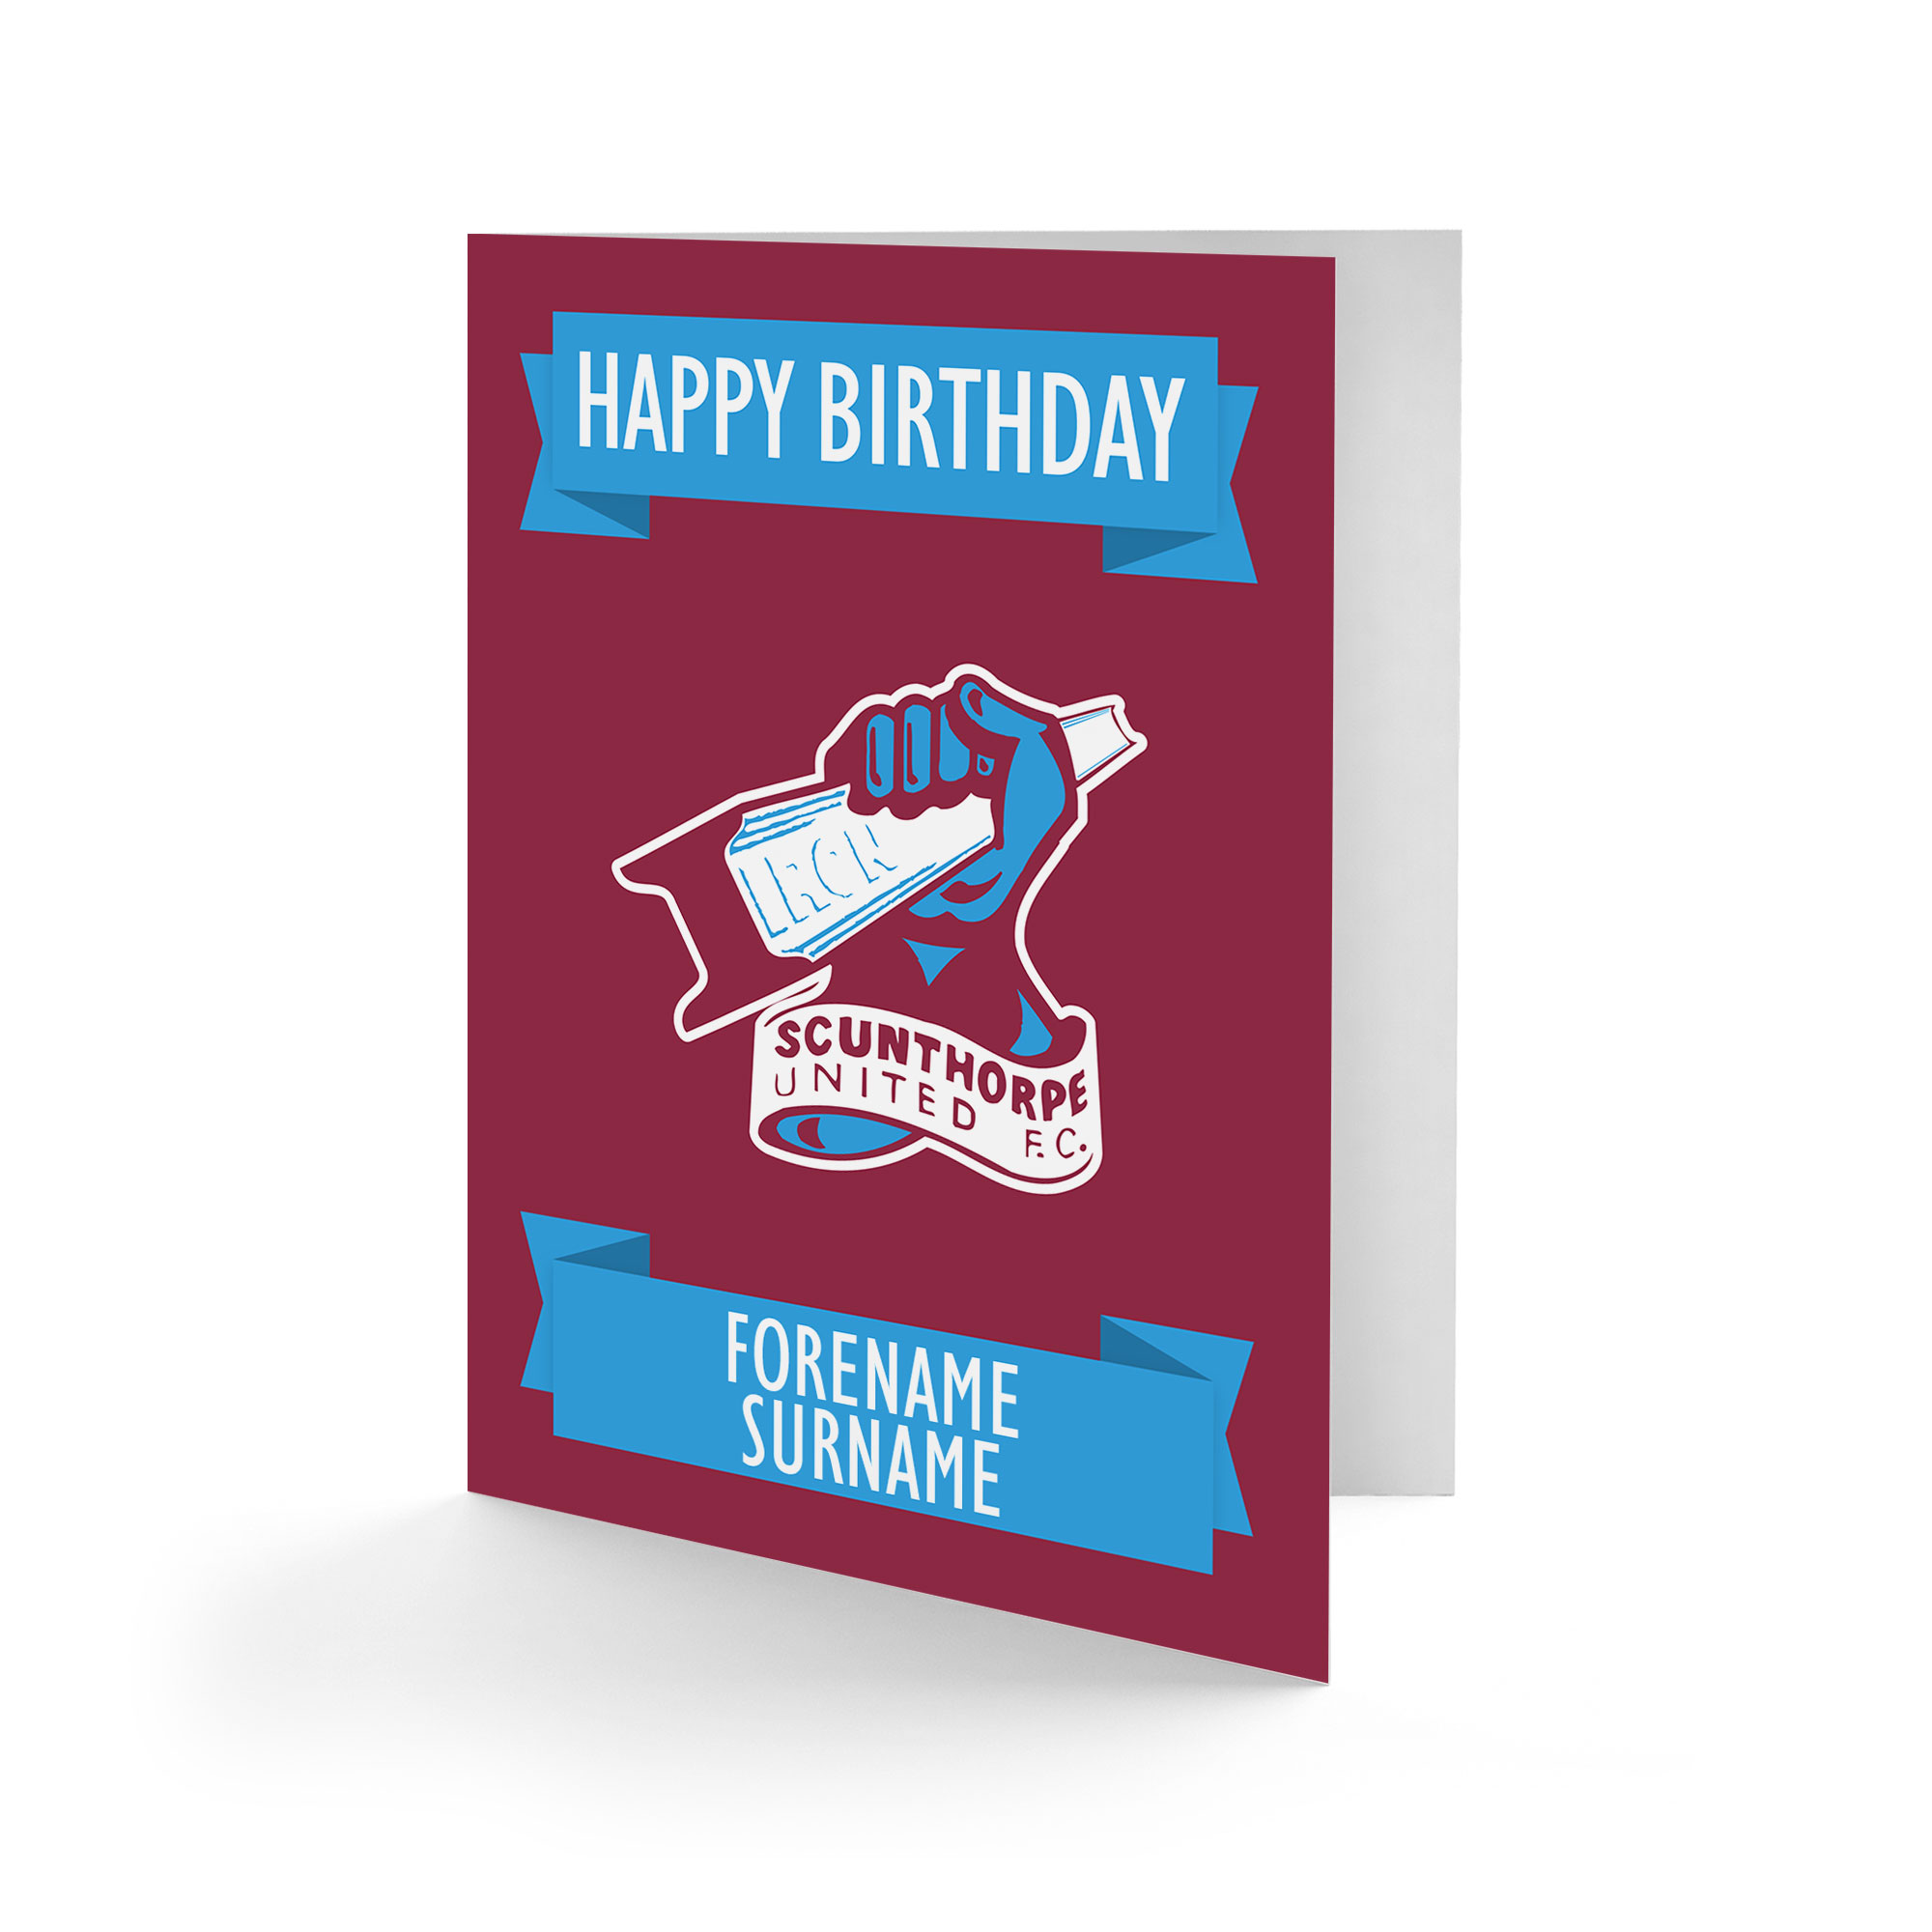 Scunthorpe United FC Crest Birthday Card